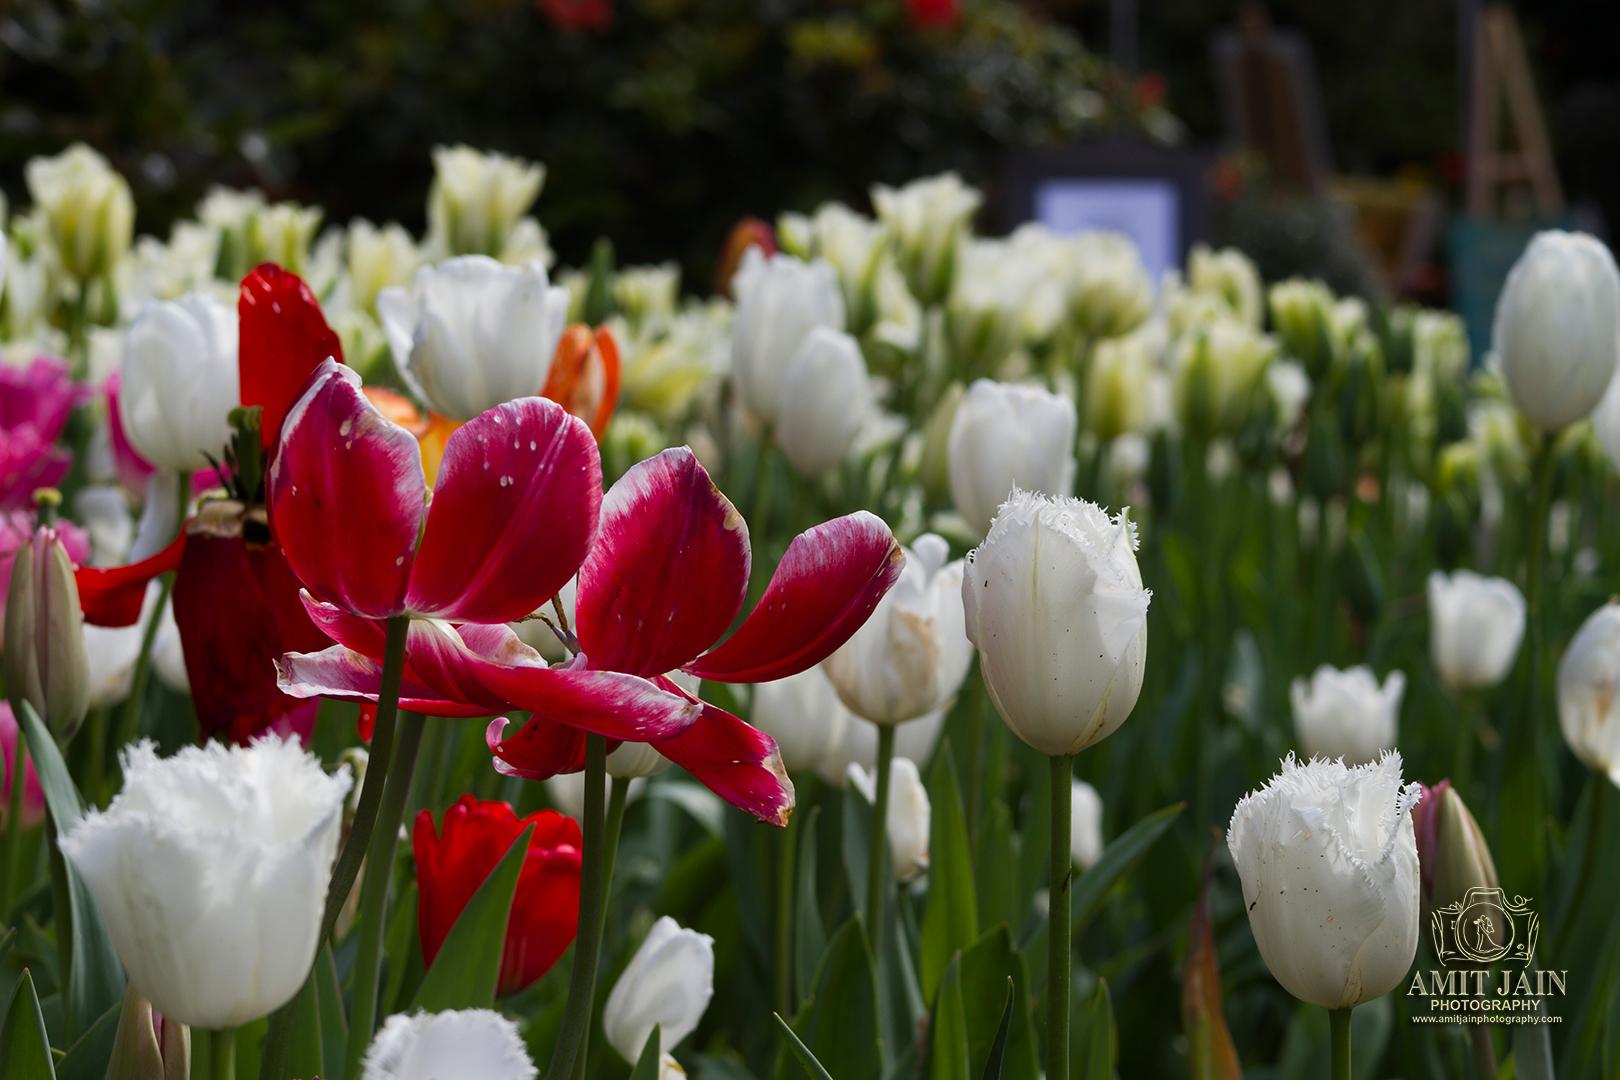 Spring Tulips In Full Bloom Stock Photo - Image of